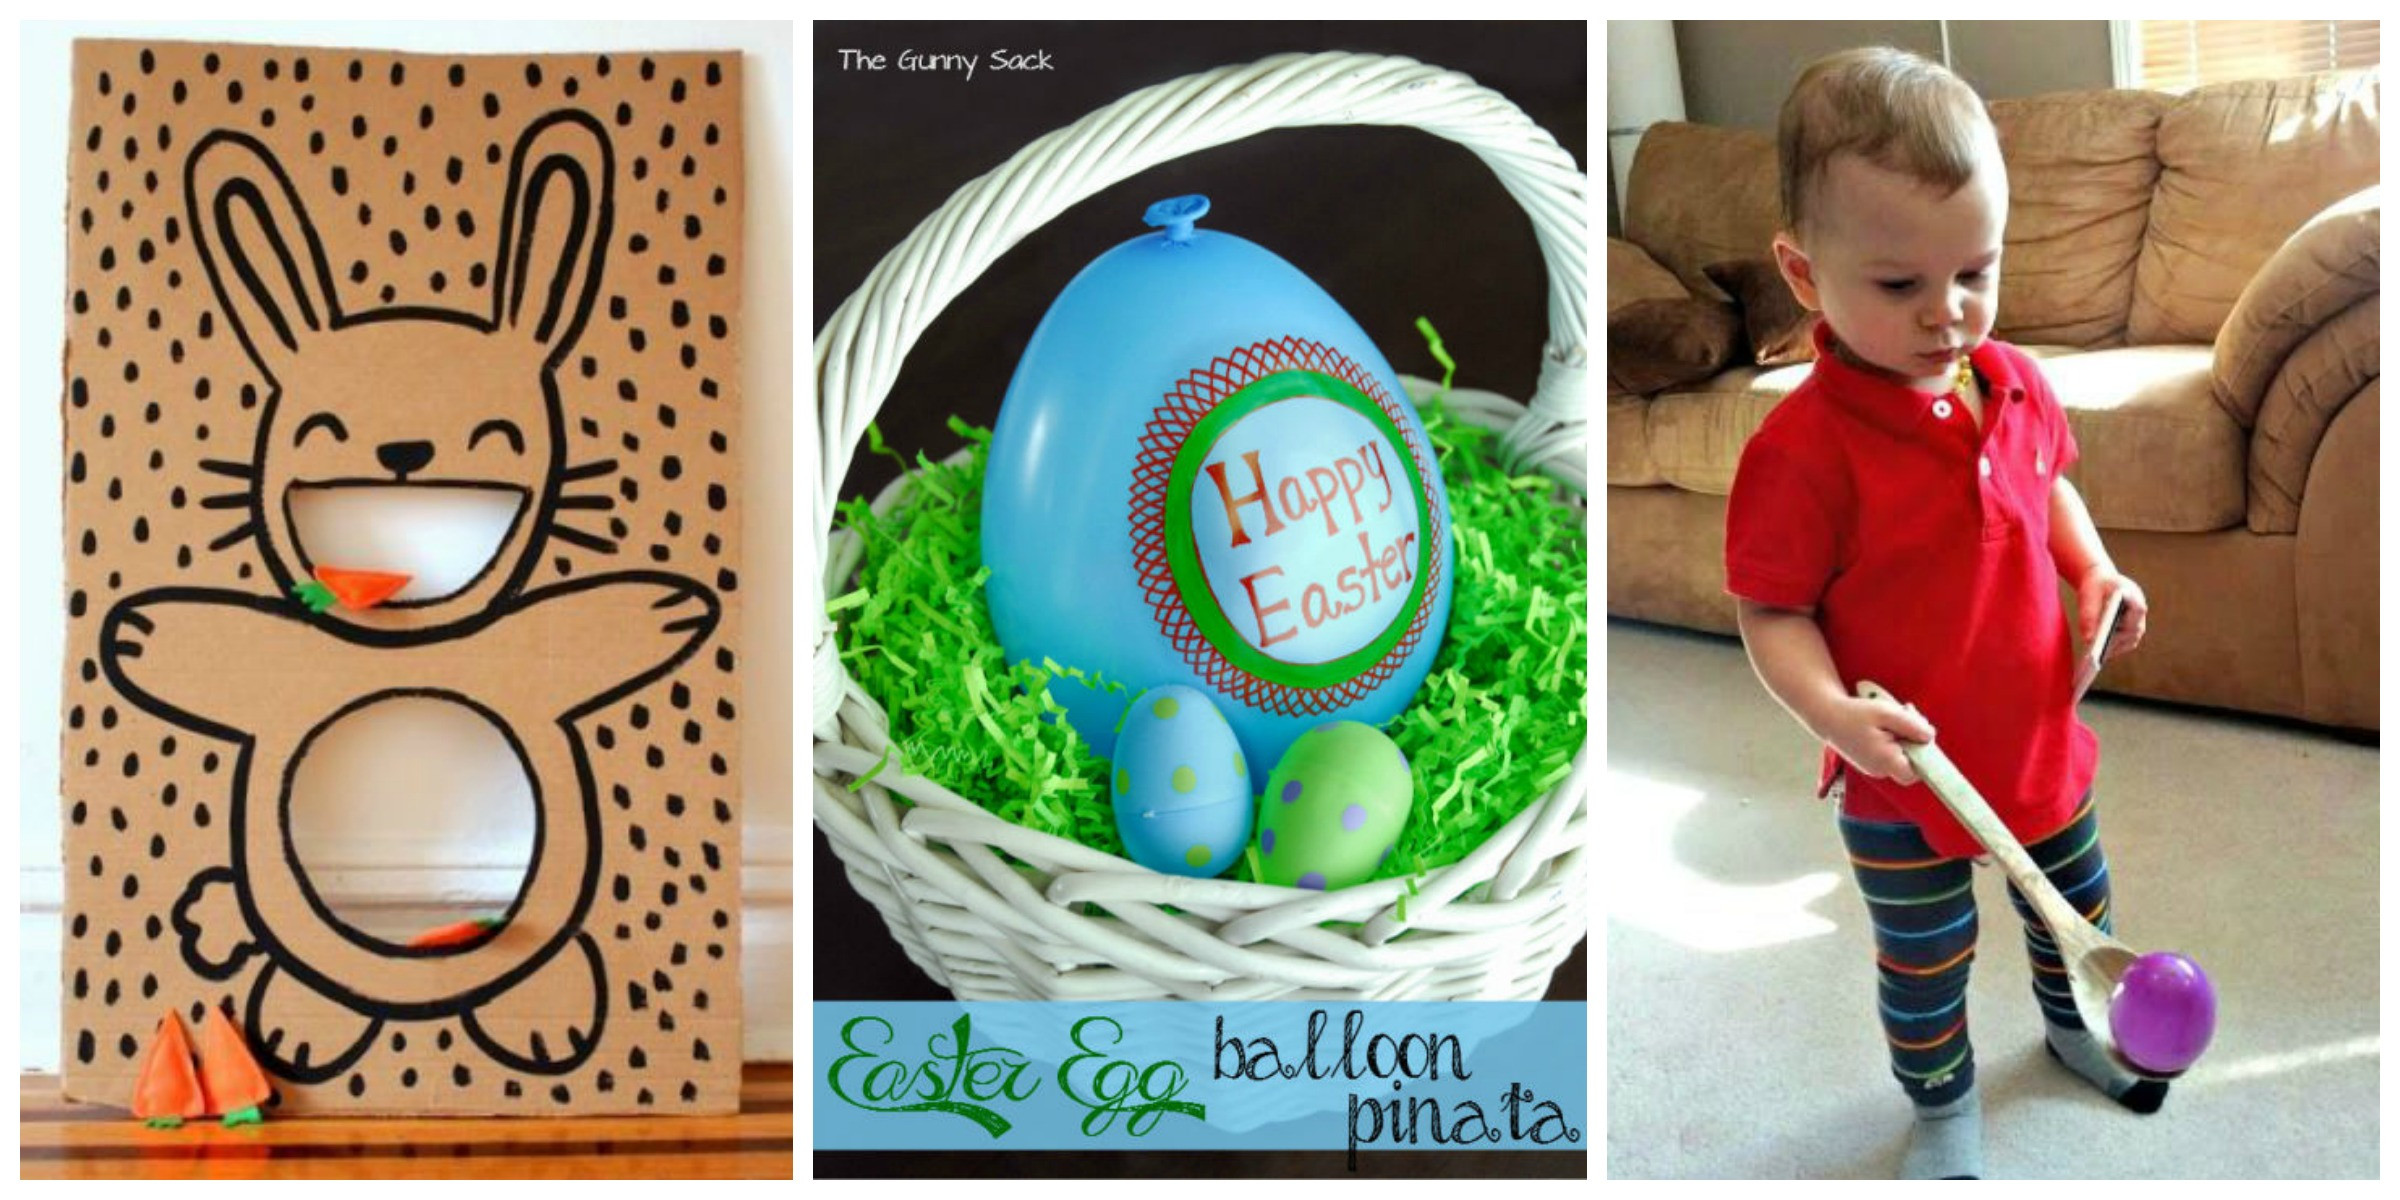 Easter Games For Kids Indoor  21 Fun Easter Games for Kids Best Easter Sunday